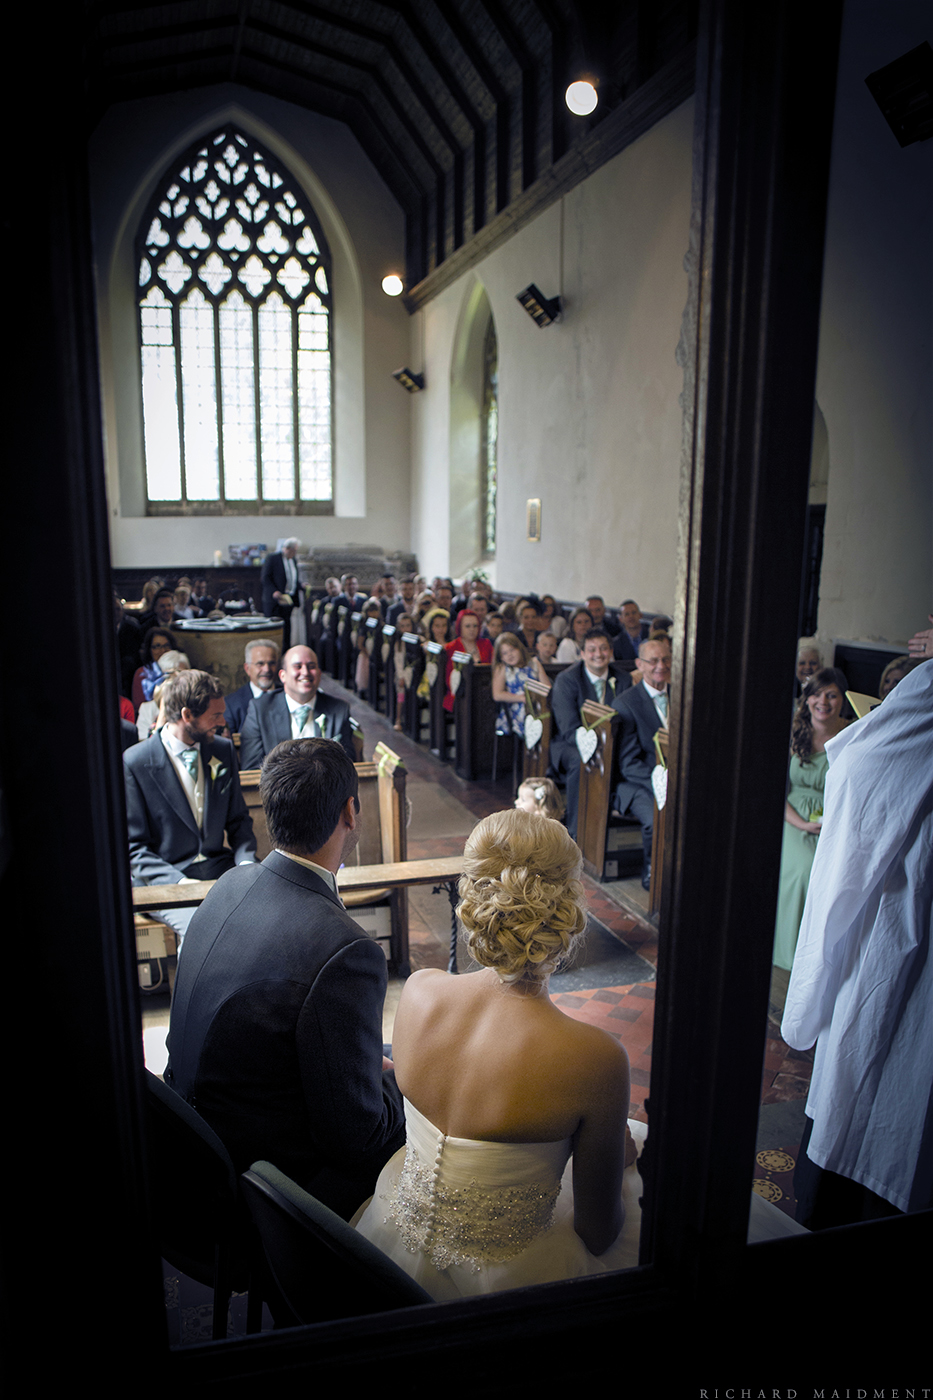 Richard Maidment - Wedding Photography (120).jpg